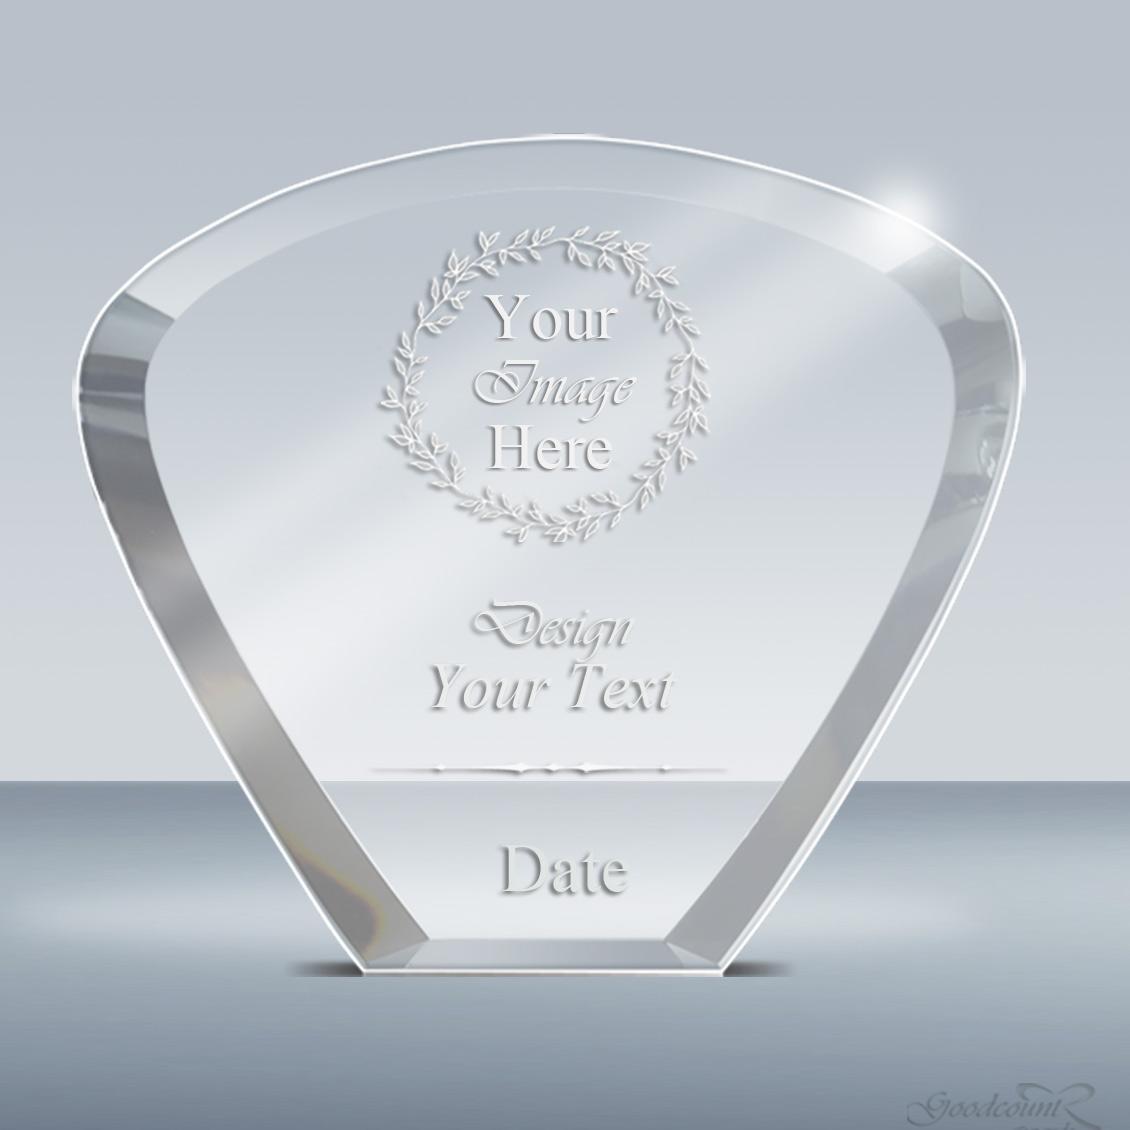 Build Your Own Award-Crystal Moon Plaque (009) – Goodcount